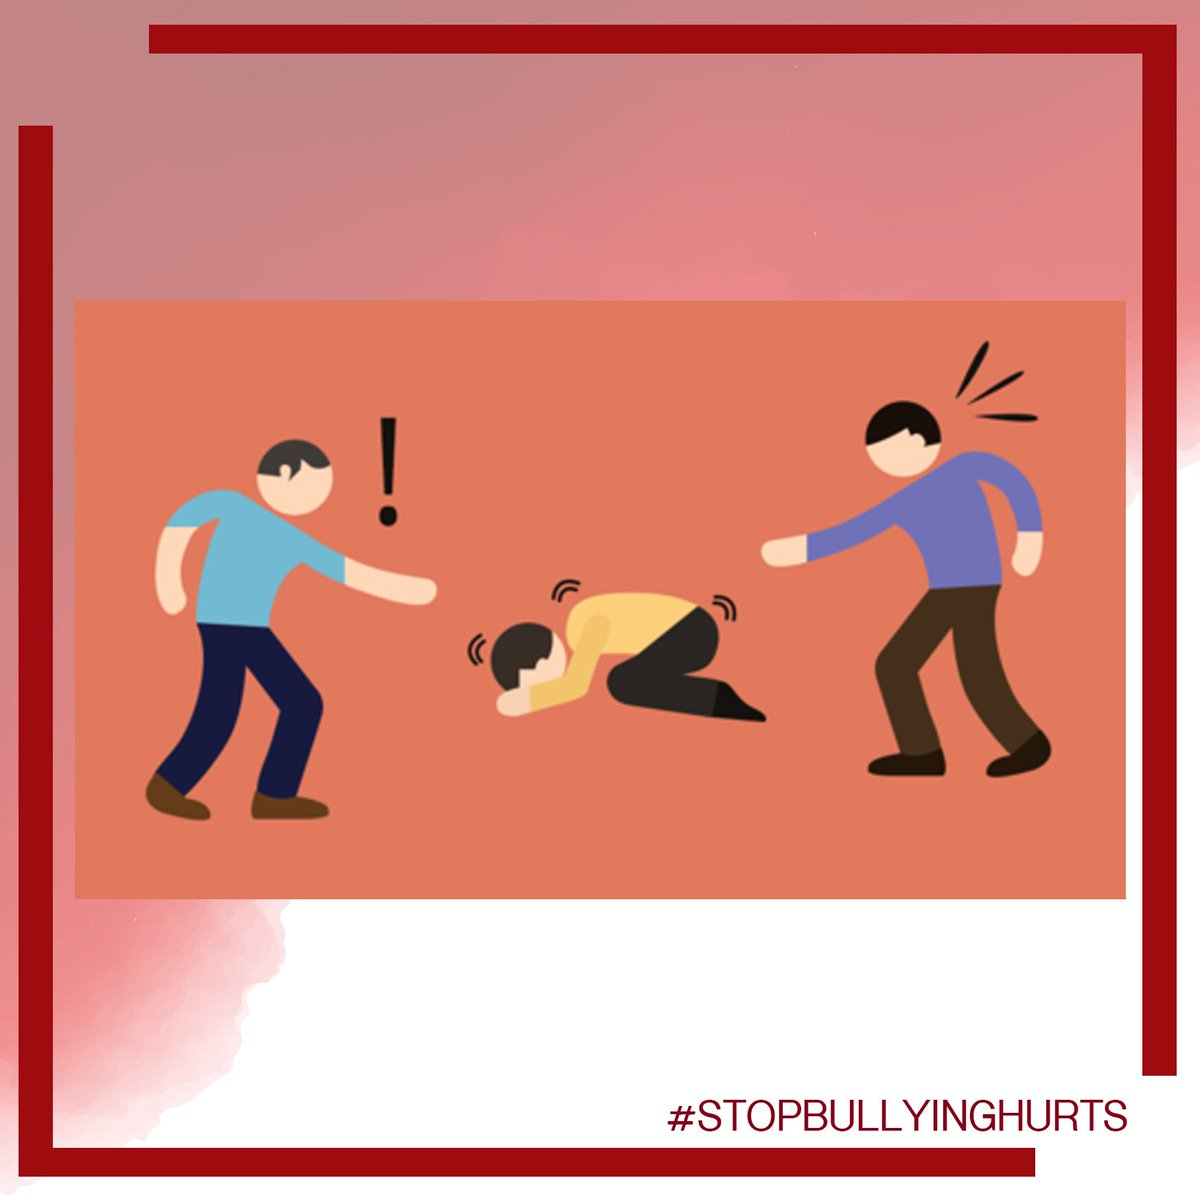 Stop Bullying Hurts Twitterren Anak Anak Yang Kegemukan Berisiko Lebih Besar Untuk Di Bully Remaja Gay Berisiko 3 Kali Lebih Besar Untuk Di Bully Dan Berkemungkinan 80 Lebih Kecil Untuk Mem Bully Anak Lain